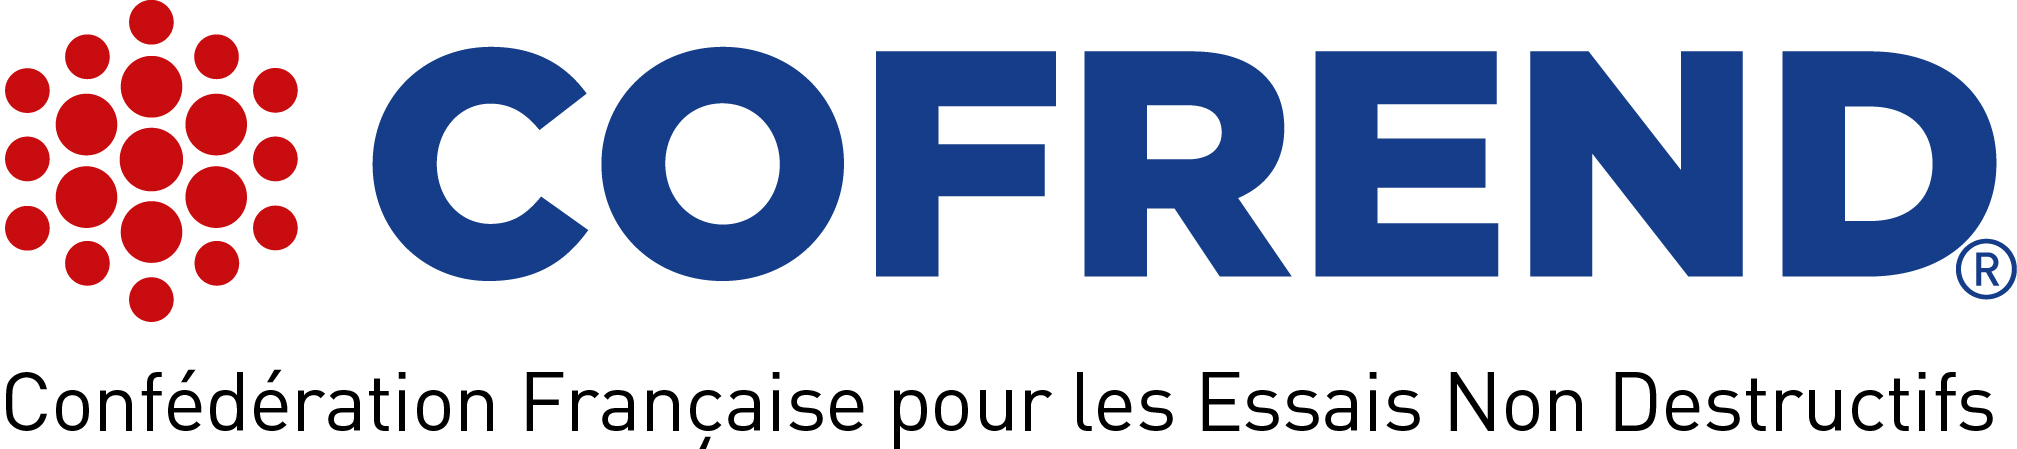 Cofrend-logo-RVB